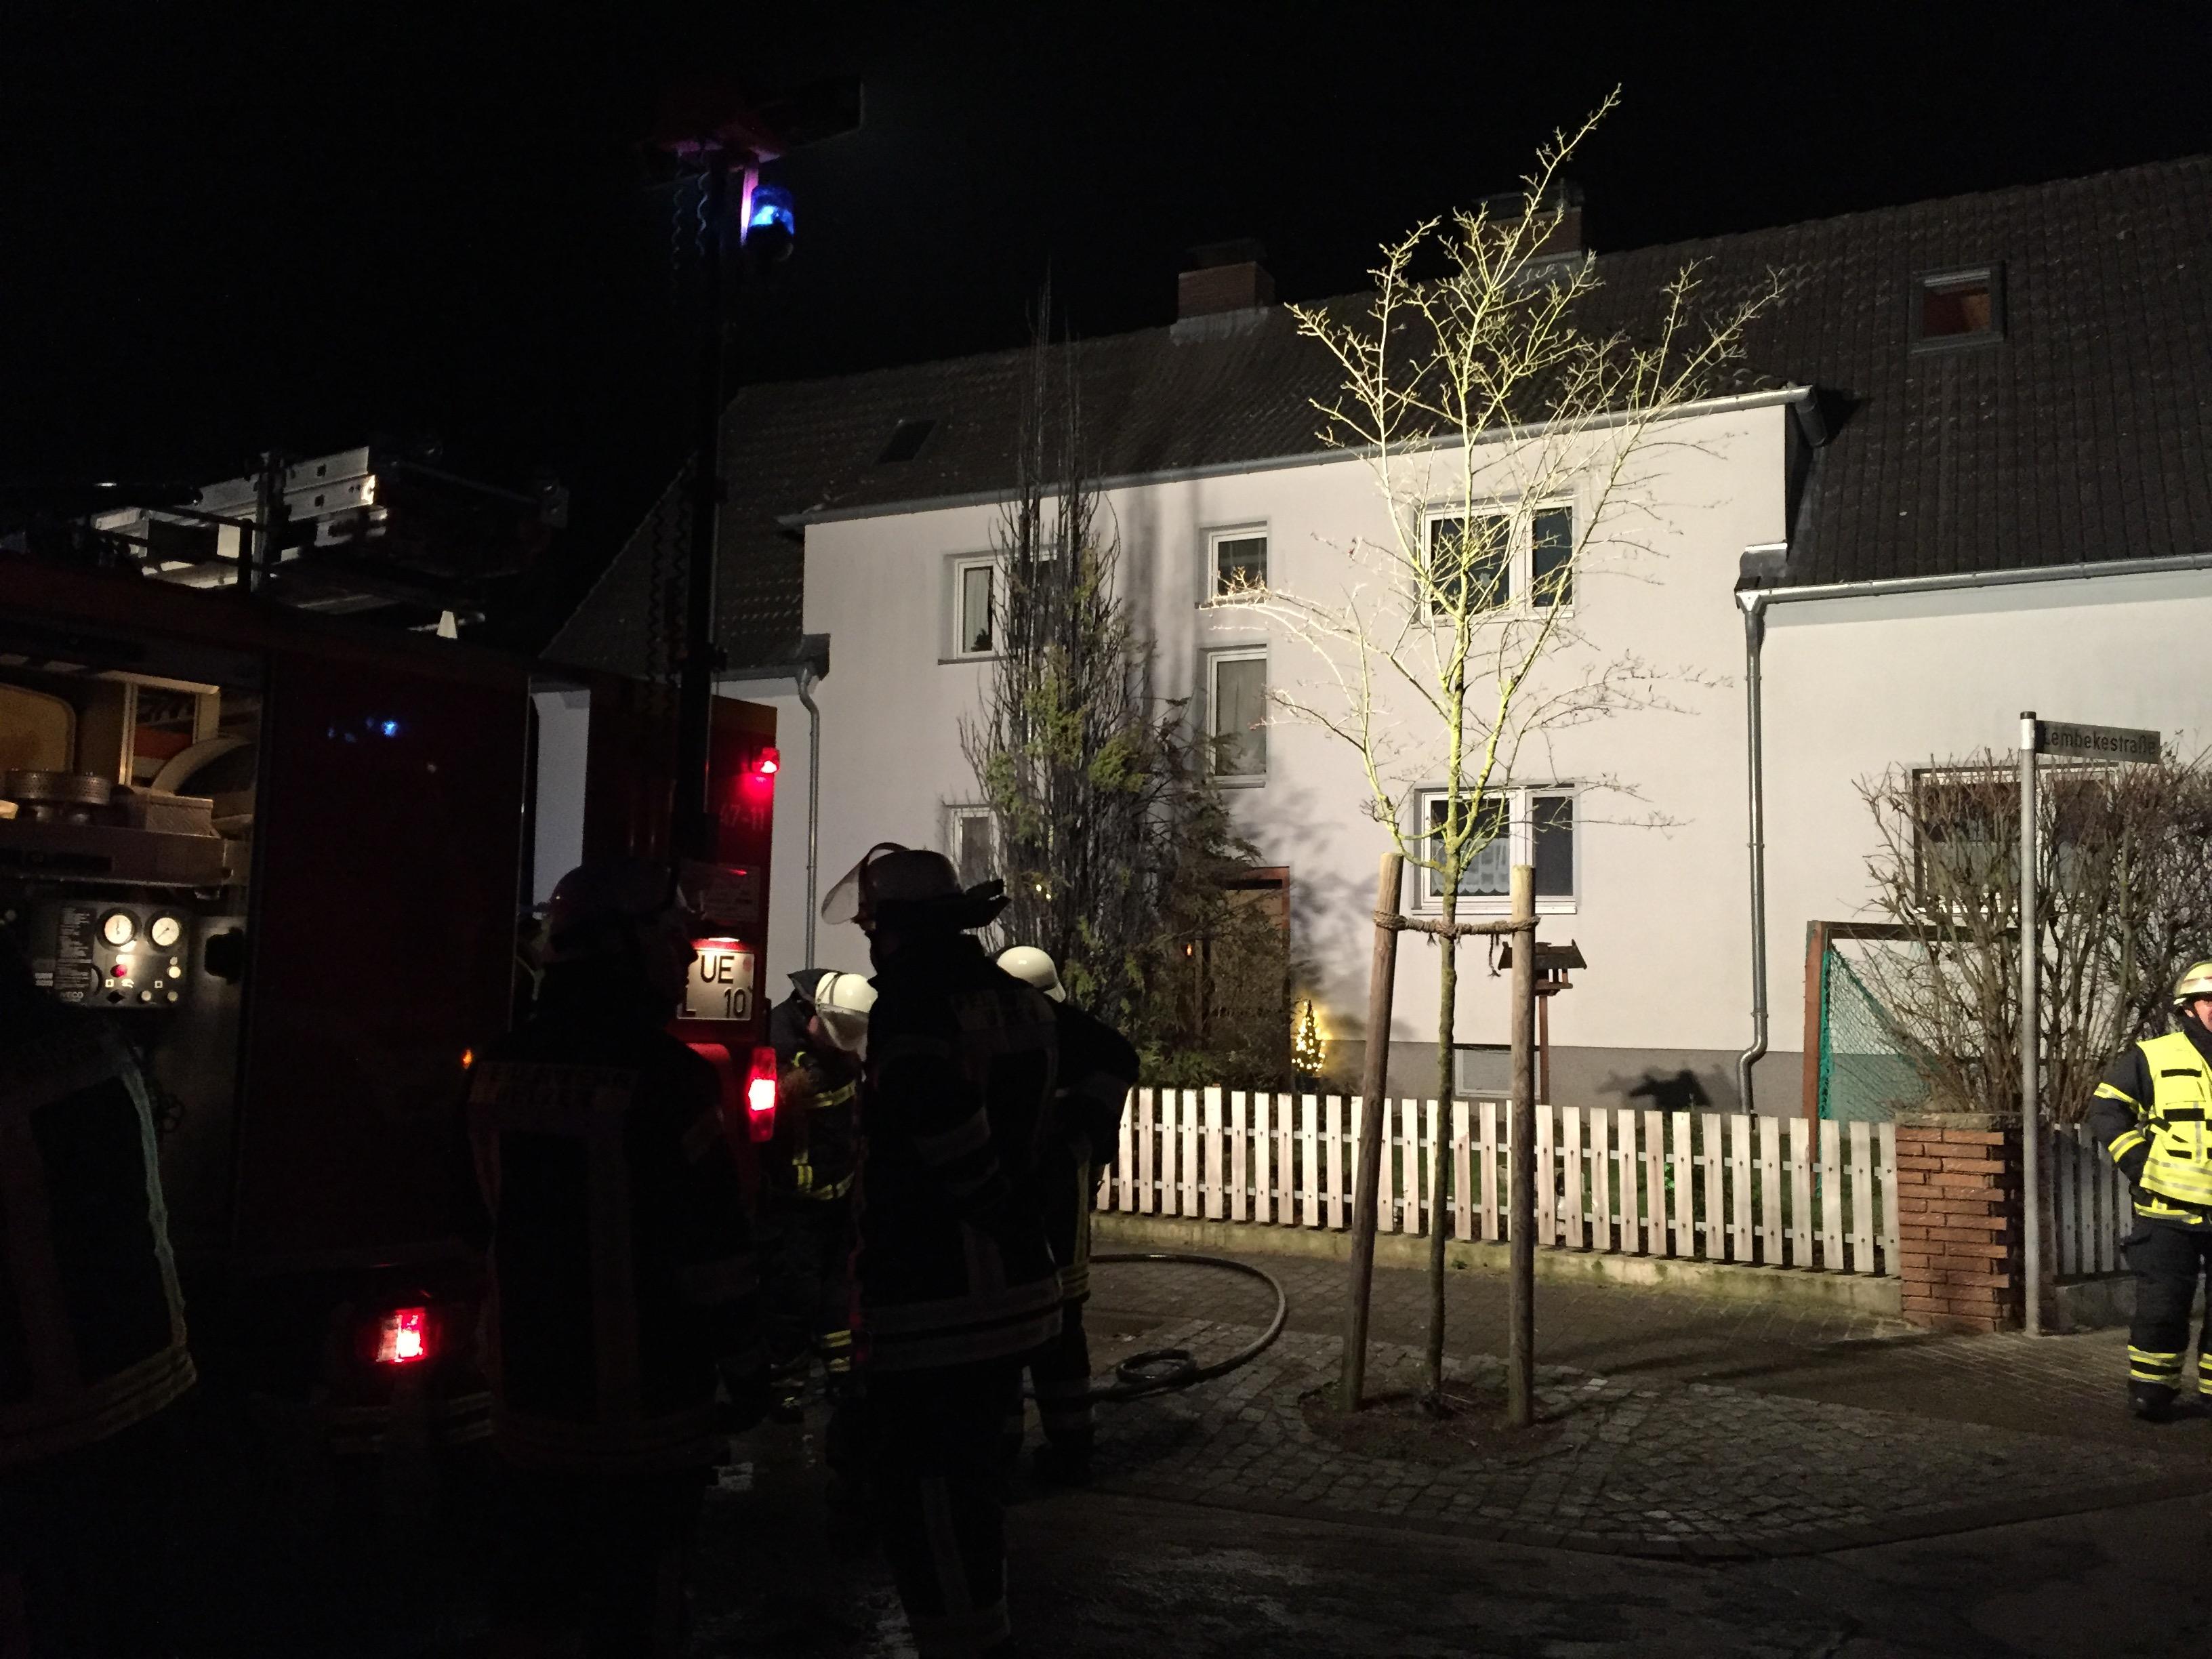 340. Brennt Baum an Mehrfamilienhaus